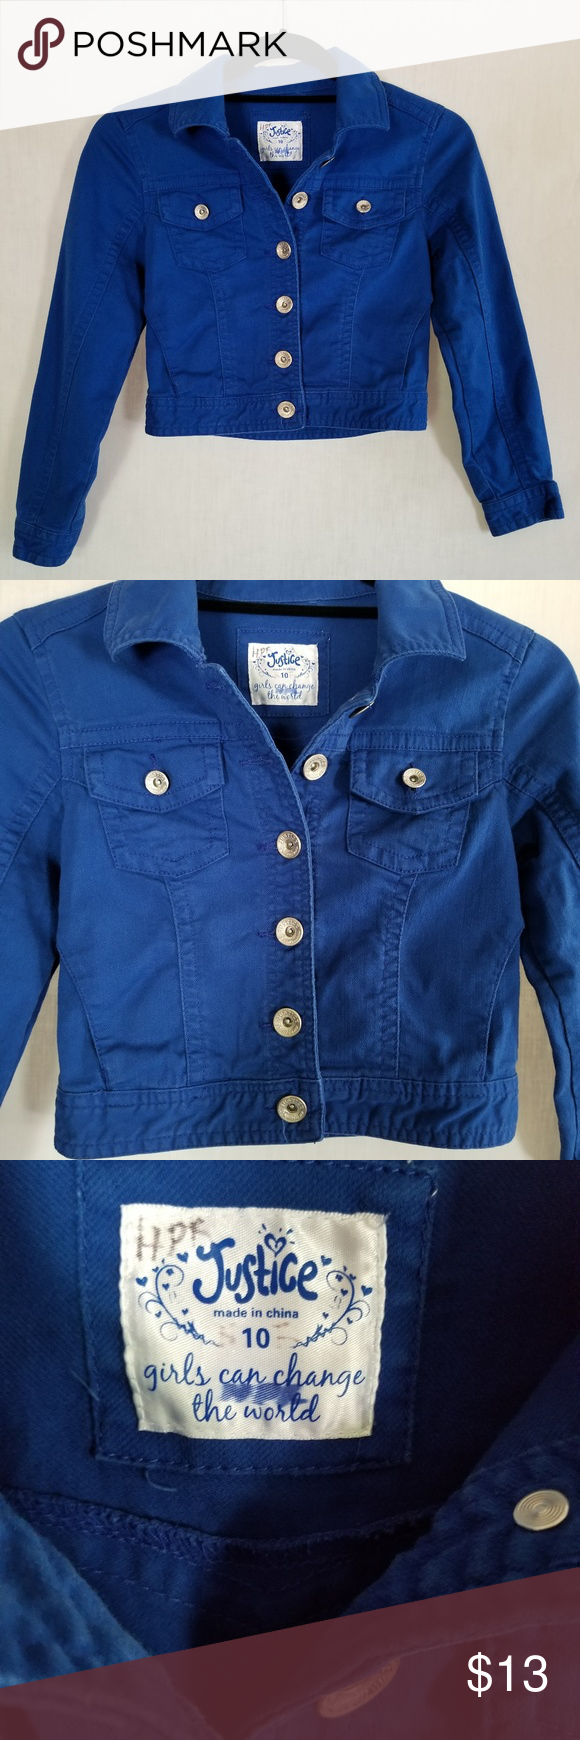 Girl S Justice Jean Jacket Royal Blue Size 10 Justice Girl S Jean Jacket Girl S Denim Jacket Girl S Size Girls Denim Jacket Jean Jacket For Girls Girls Jacket [ 1740 x 580 Pixel ]